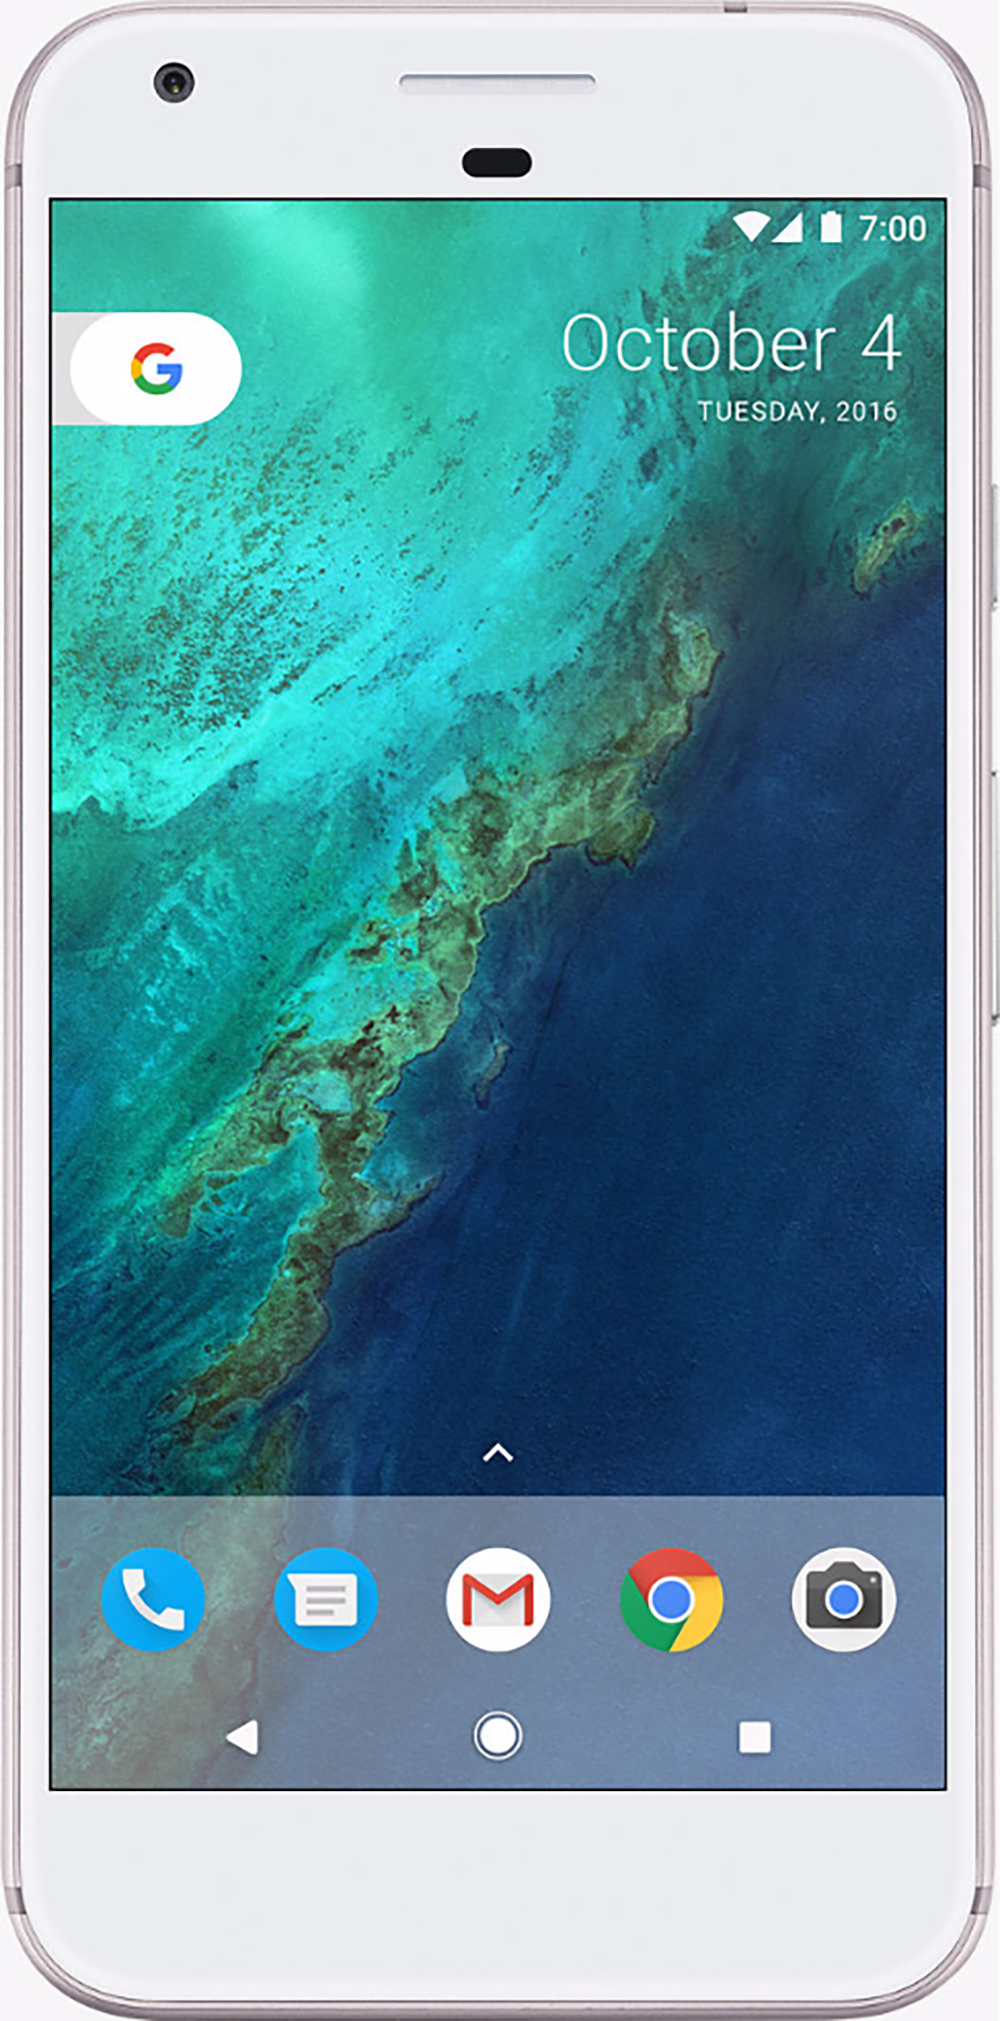 Google Pixel XL 128GB Unlocked GSM Phone w/ 12.3MP Camera - Very...